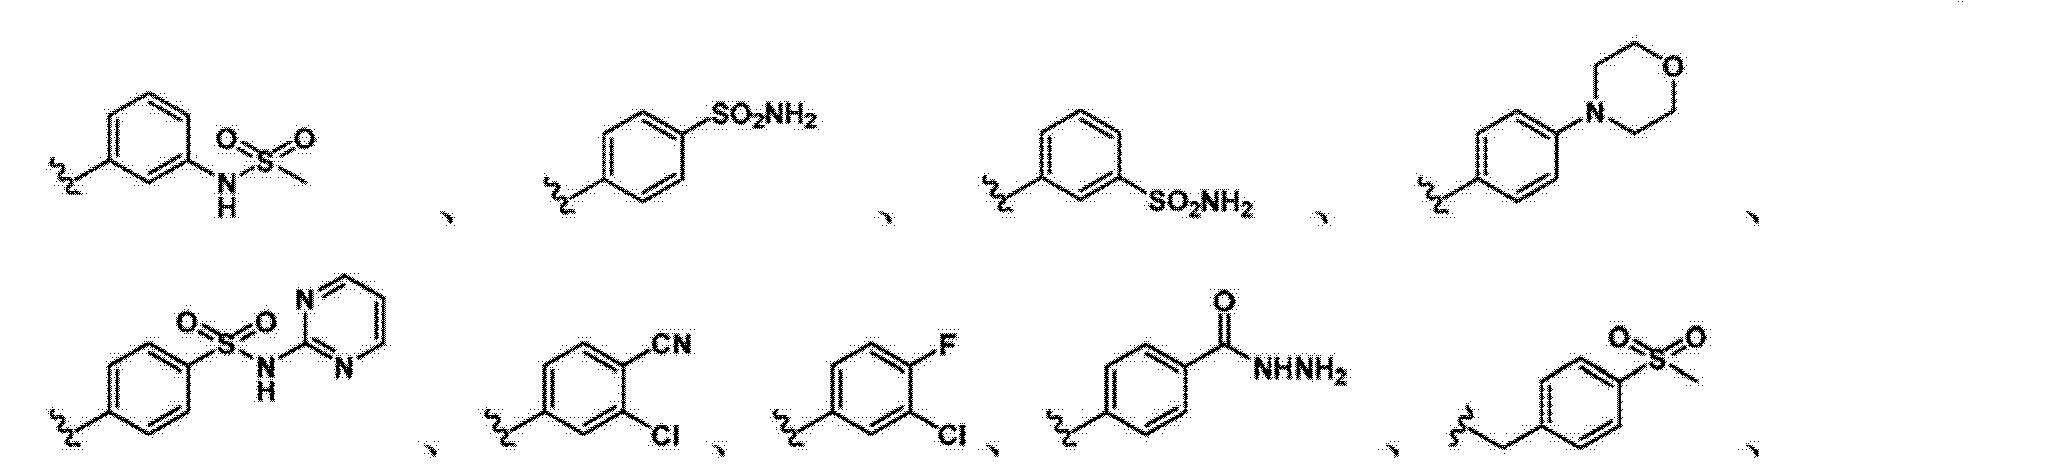 Figure CN103929963AD00842